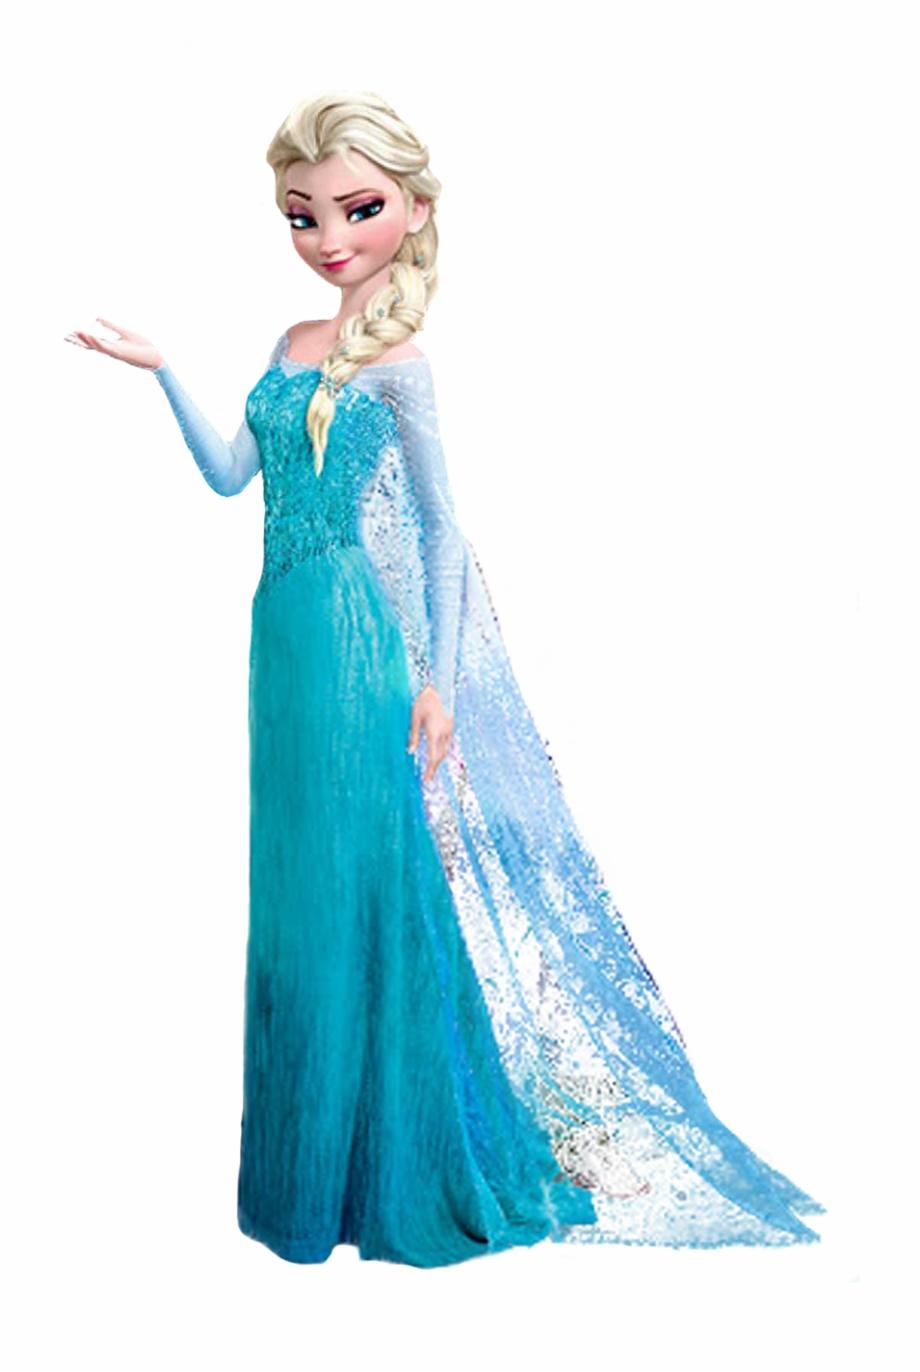 Elsa Da Frozen Png Frozen Elsa Full Body Frozen Png Free Png Images Backgrounds 418009 Pnglot Seni